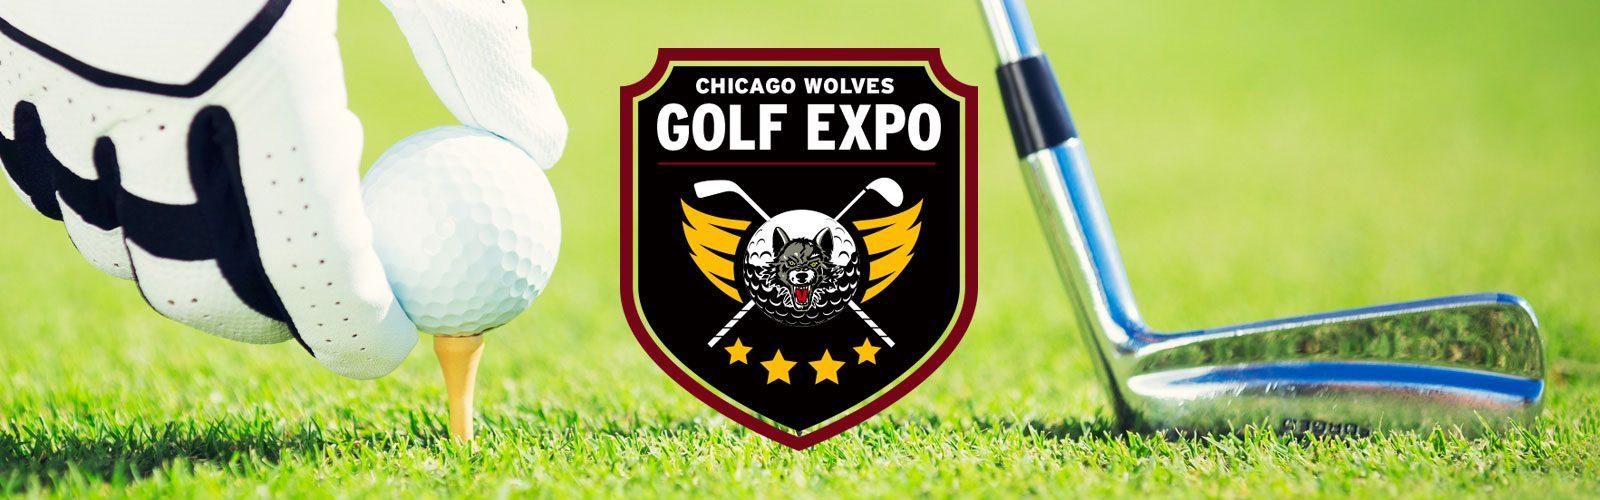 Golf_expo-header-no-date